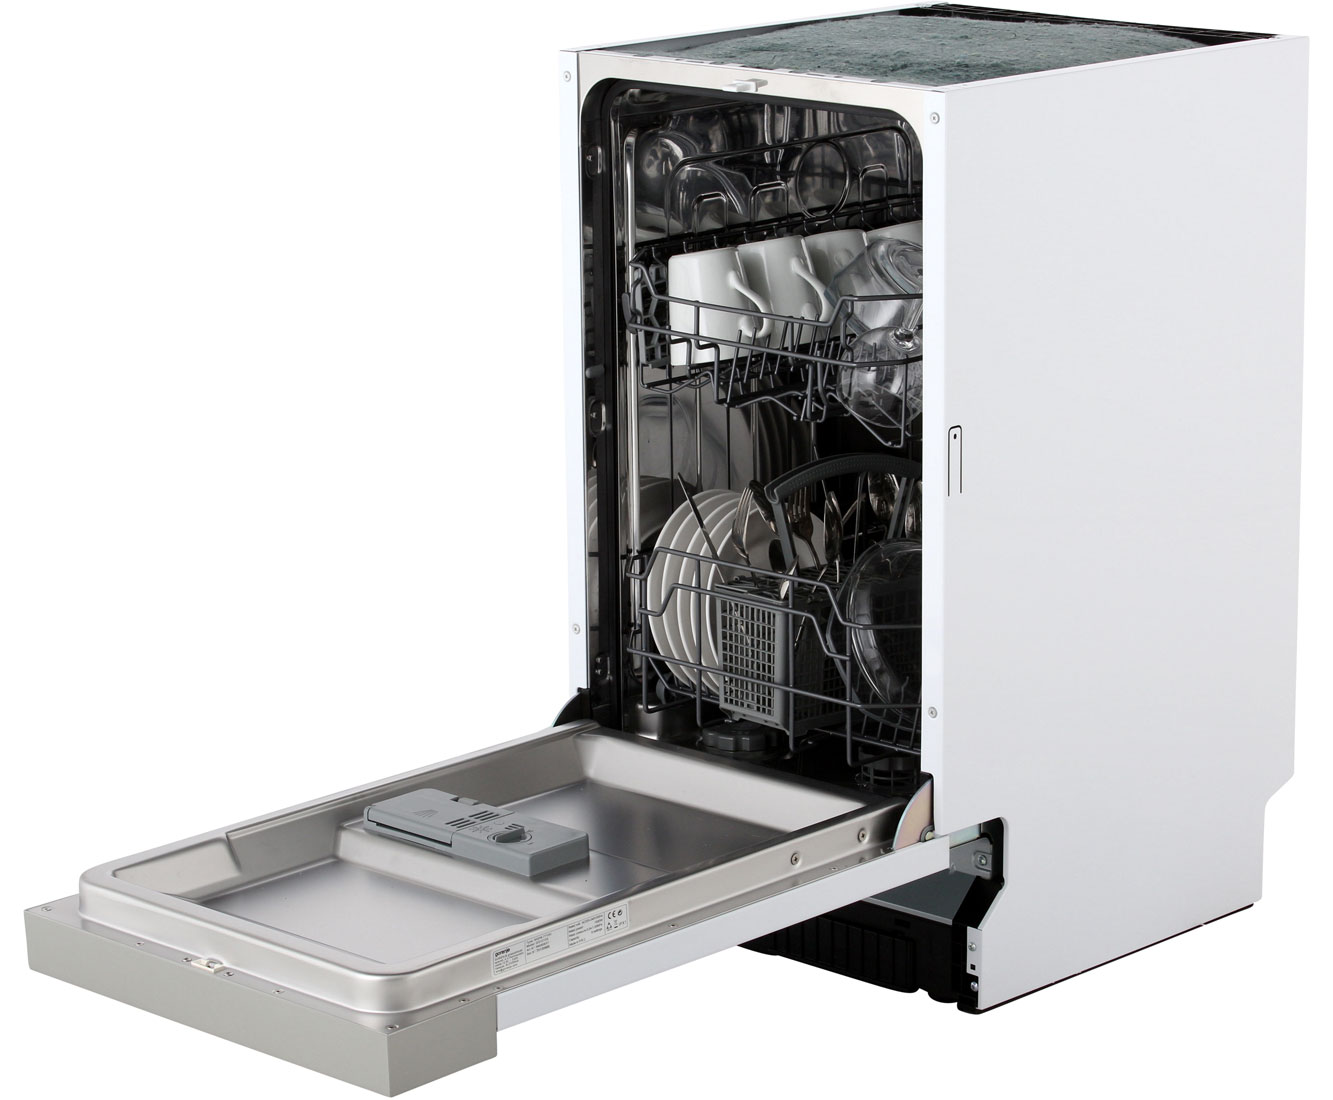 Aeg Kühlschrank Santo Zu Kalt : Gorenje gi 51010 x teilintegrierter geschirrspüler 45 cm